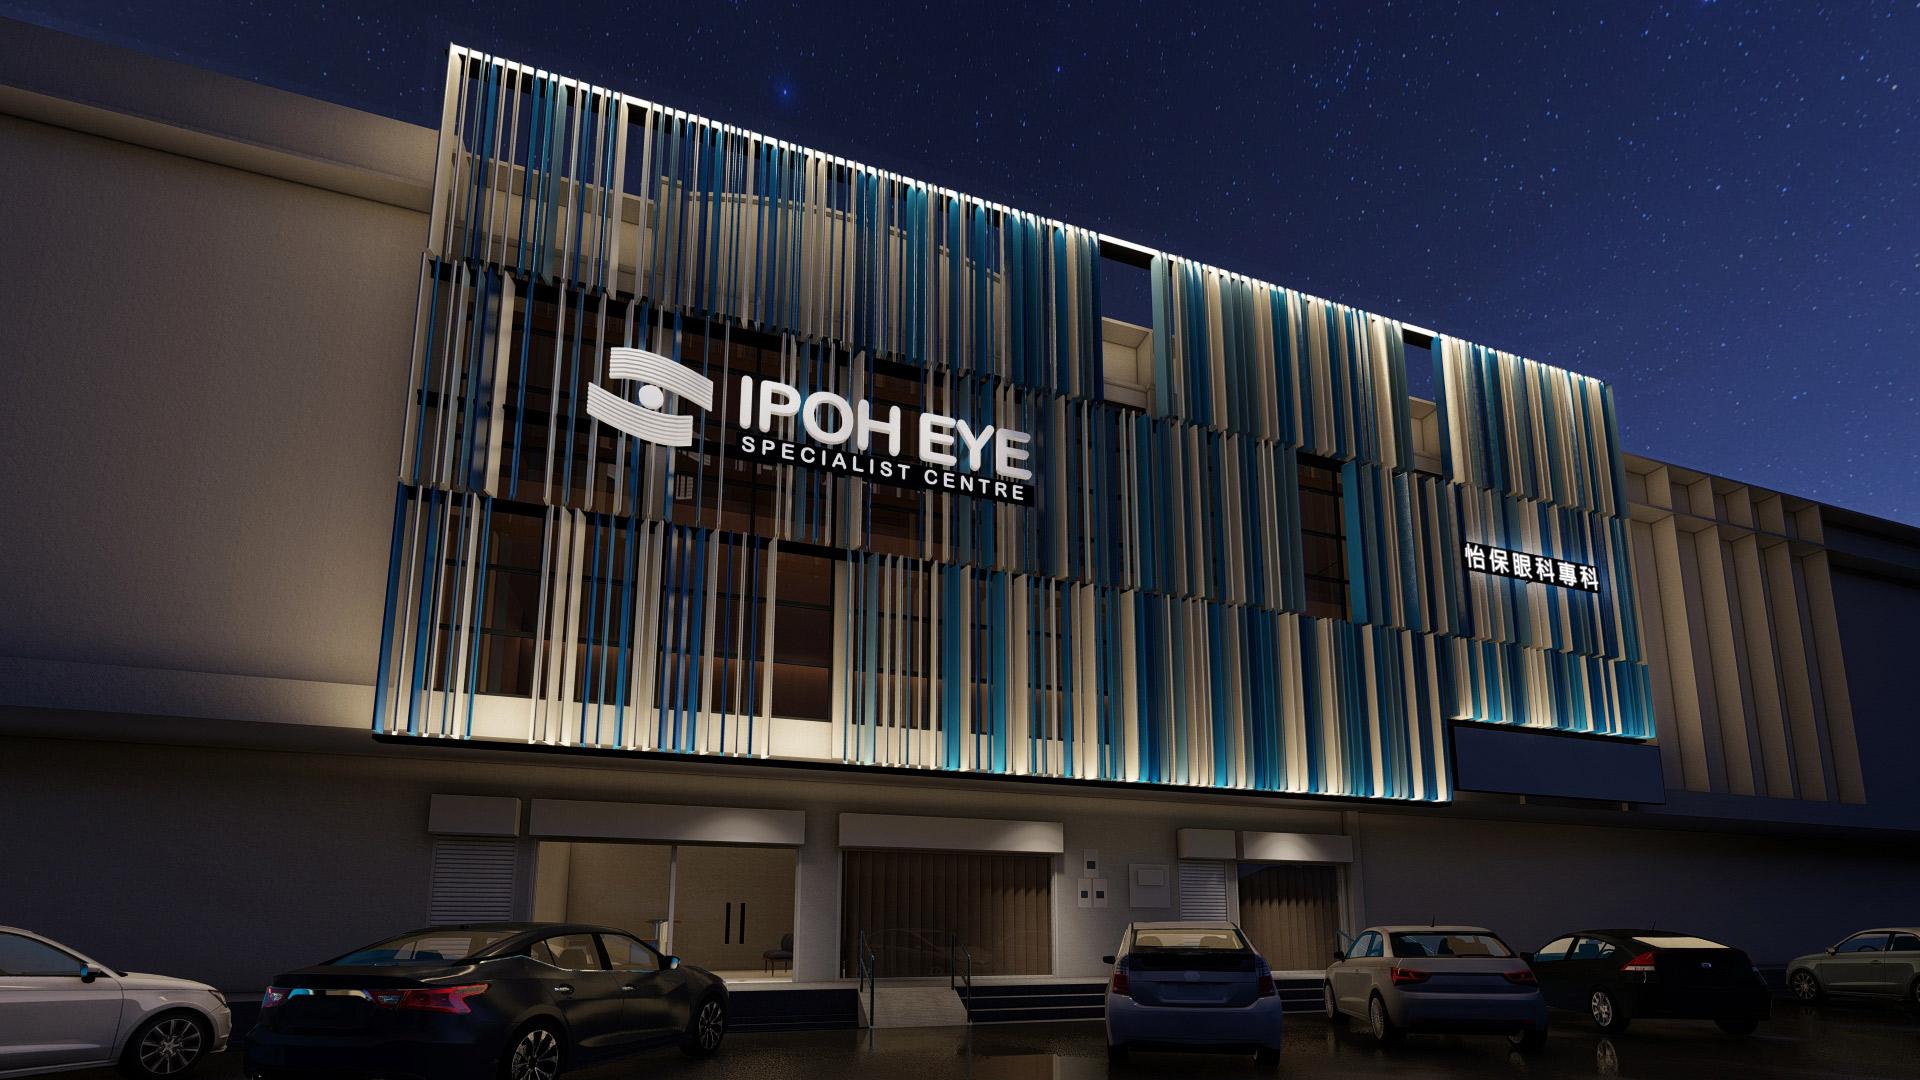 Ipoh Eye Specialist Centre